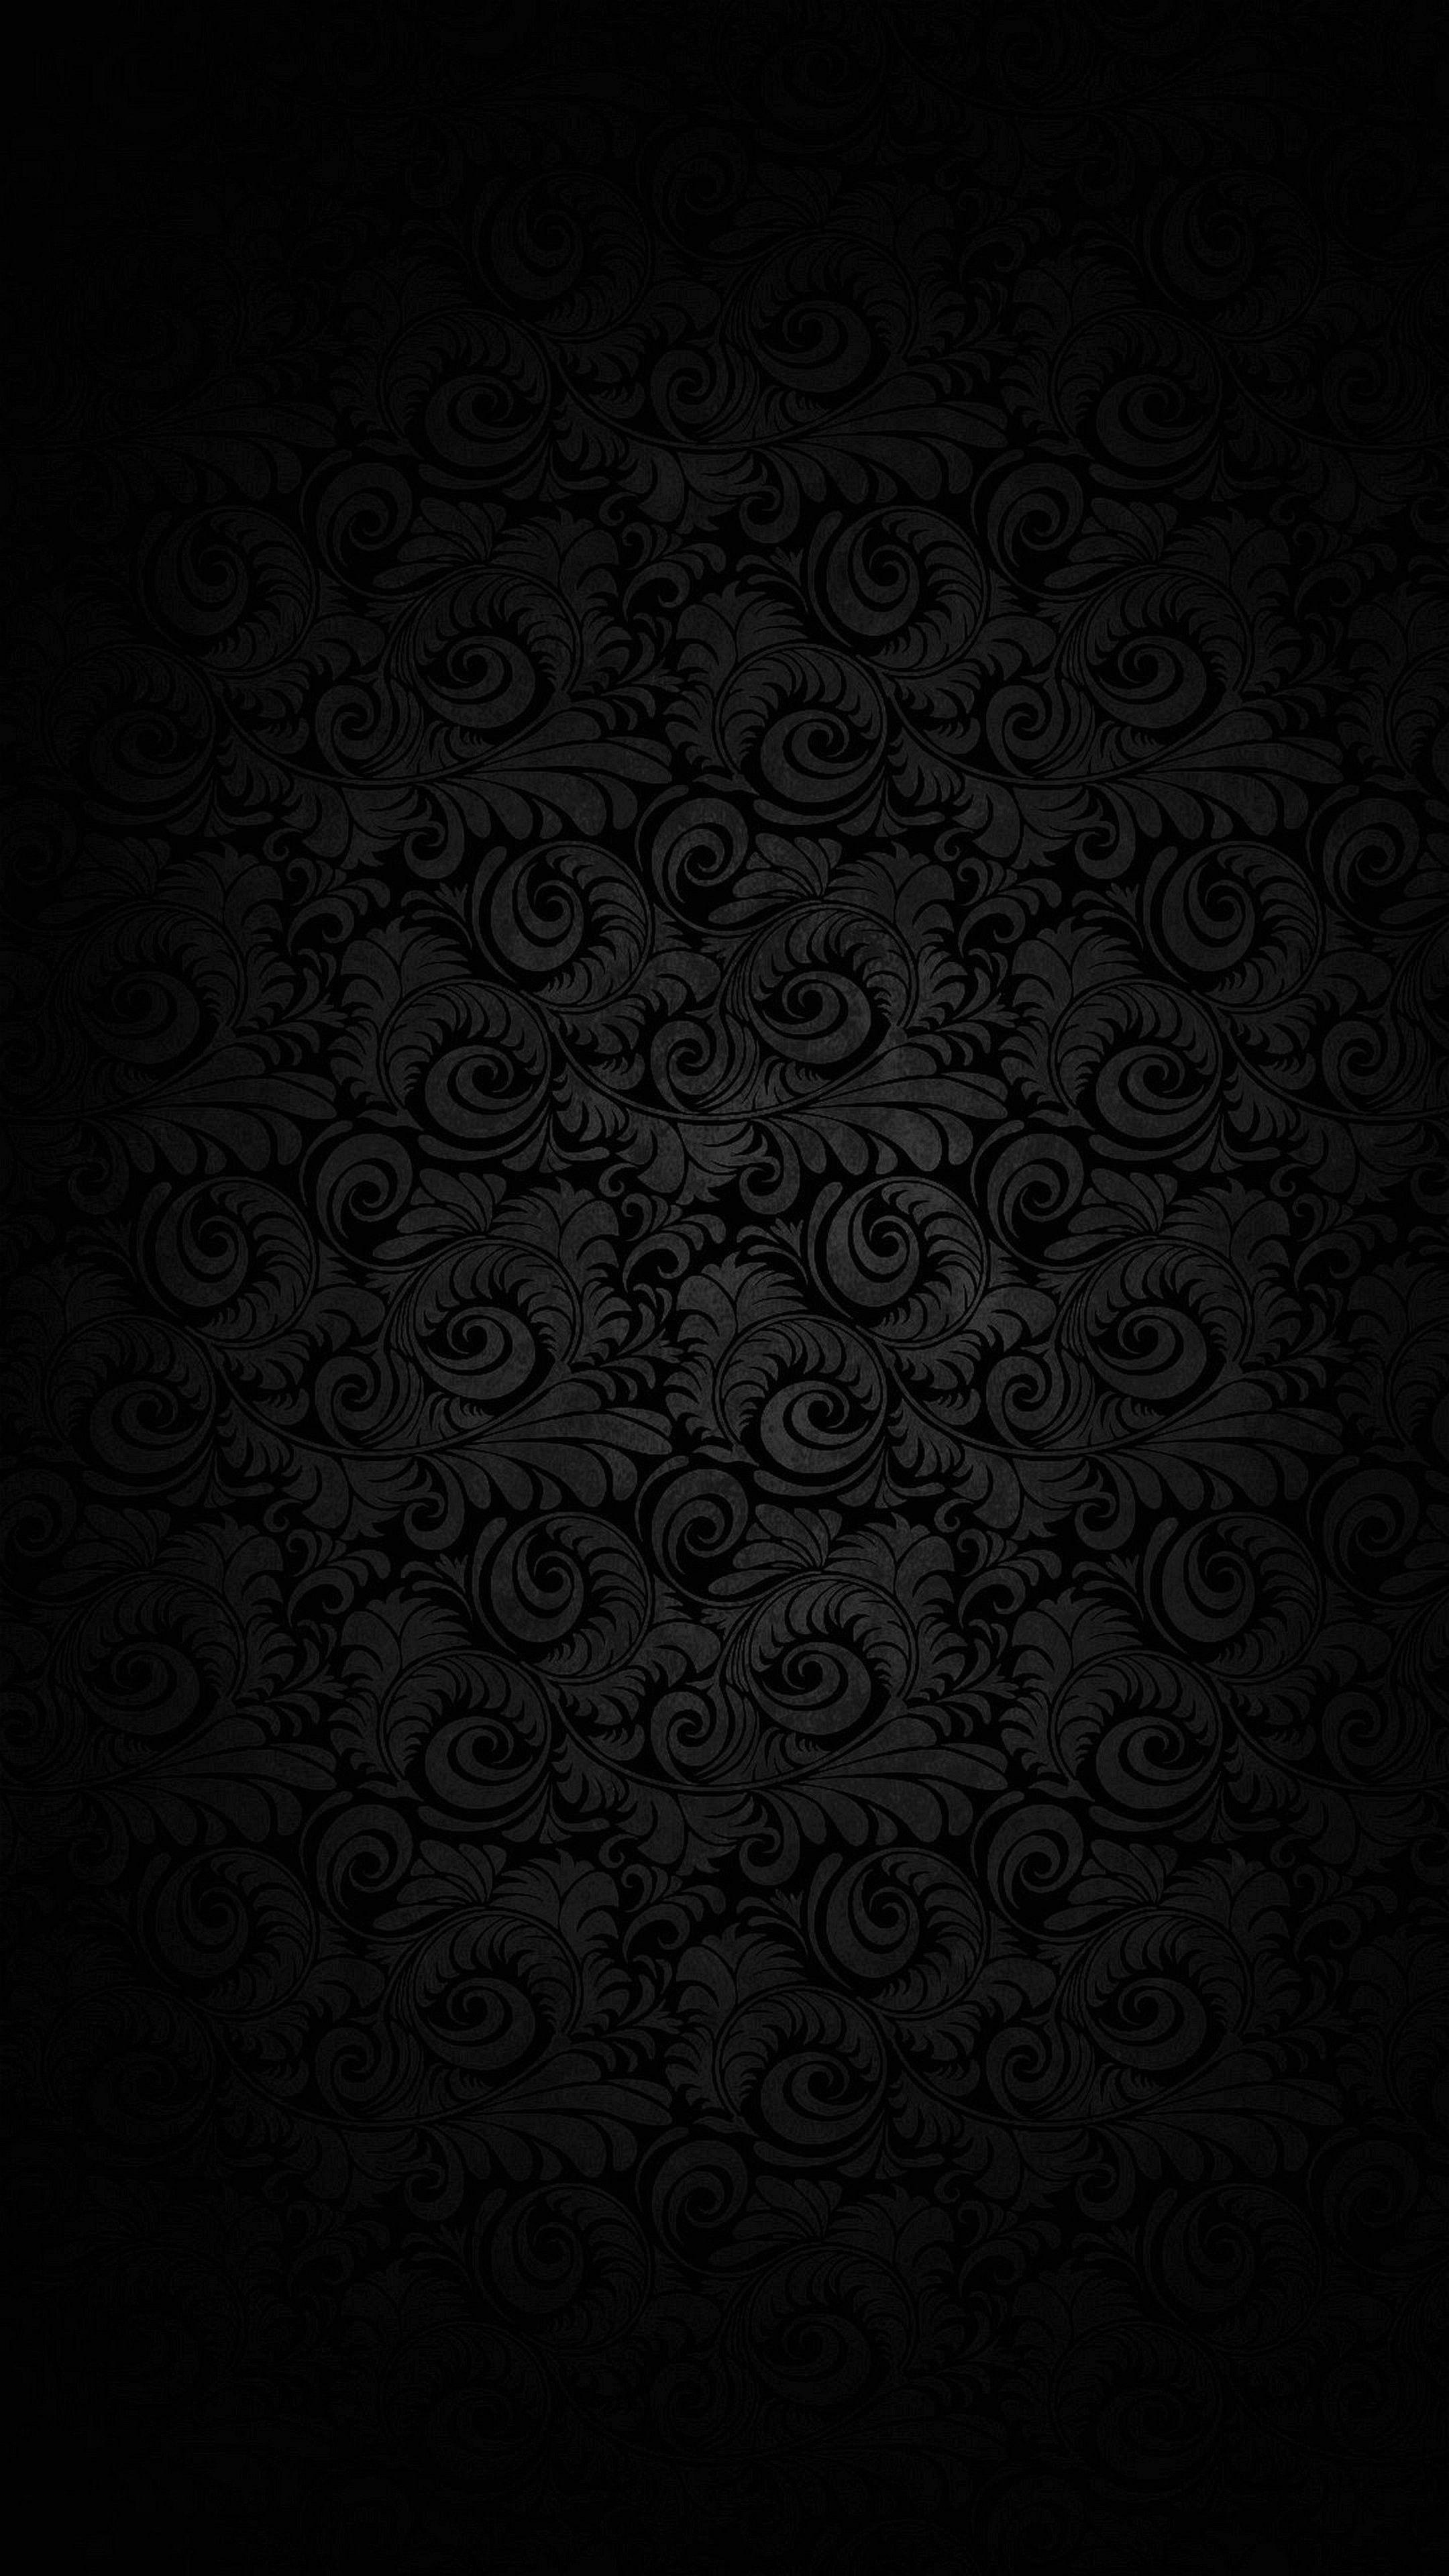 Samsung Black Wallpapers Wallpaper Cave